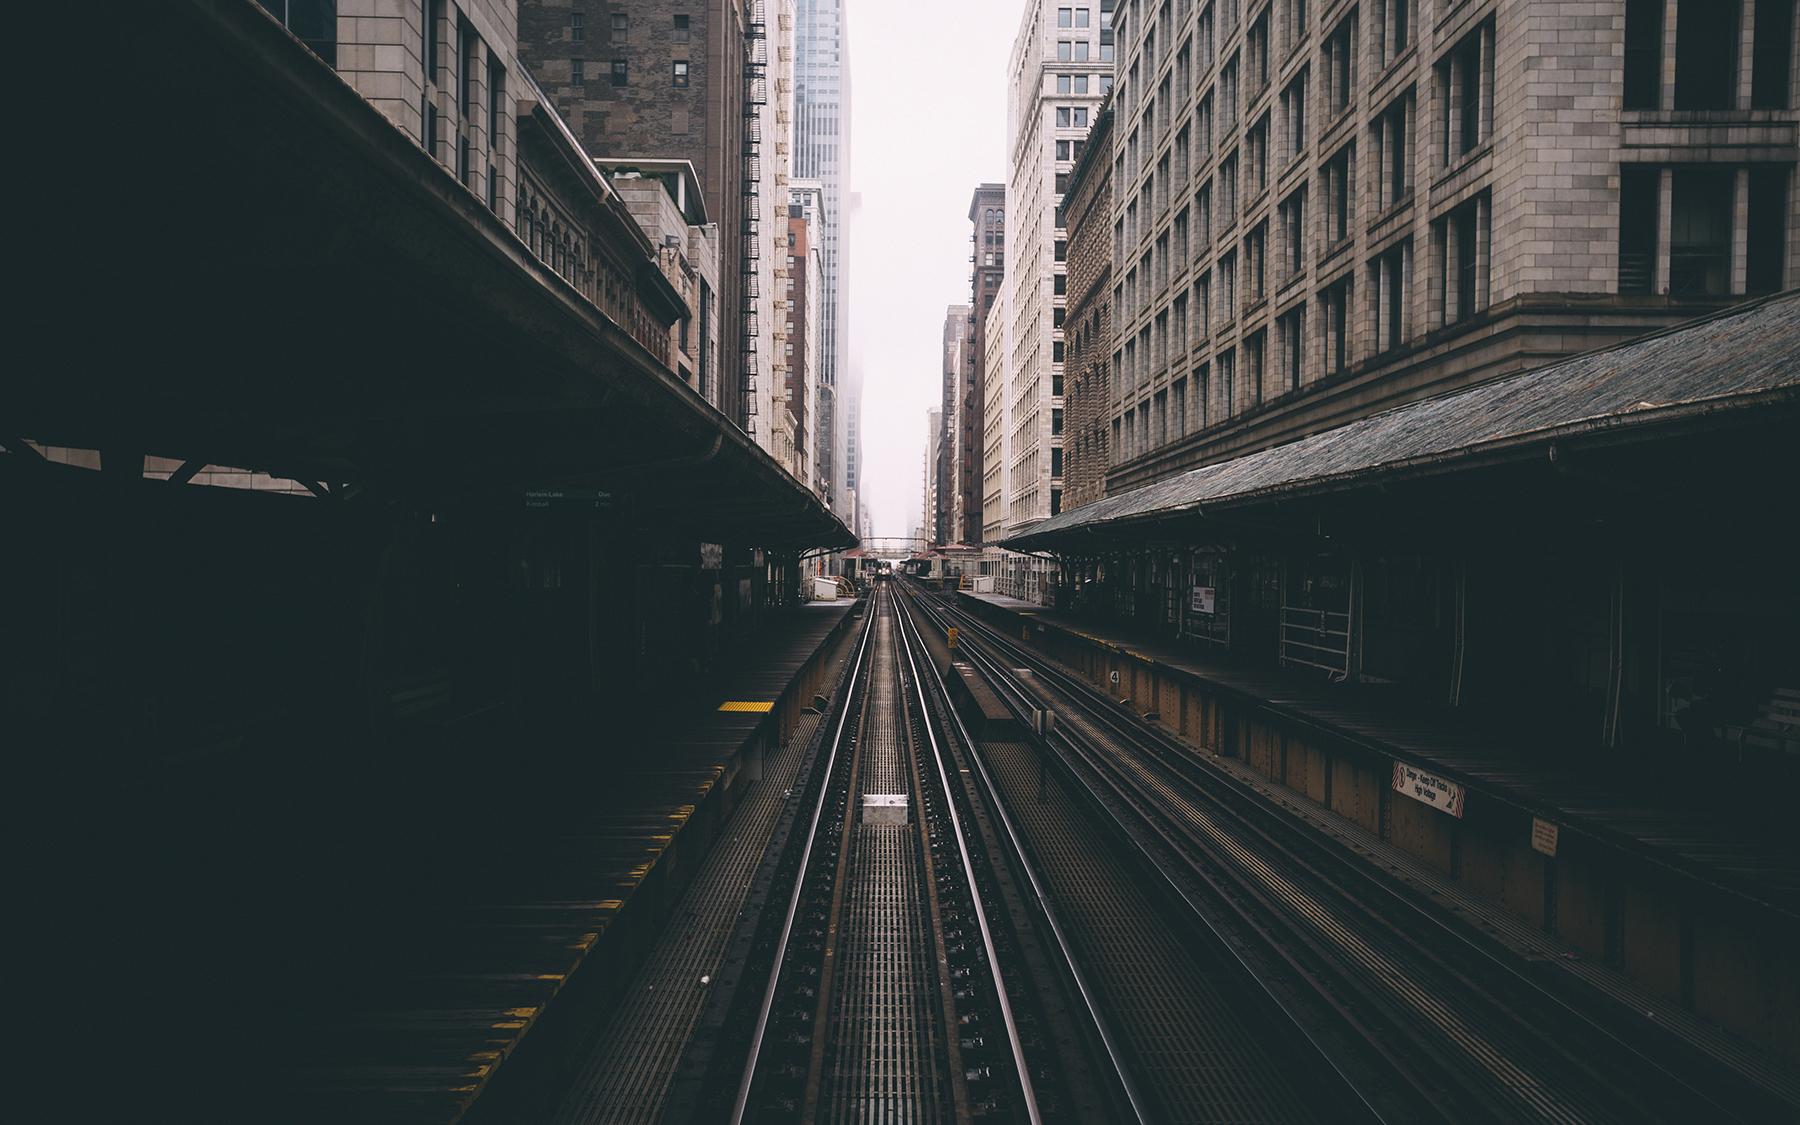 Subway, Terminal, Train, Train Station, Transportation